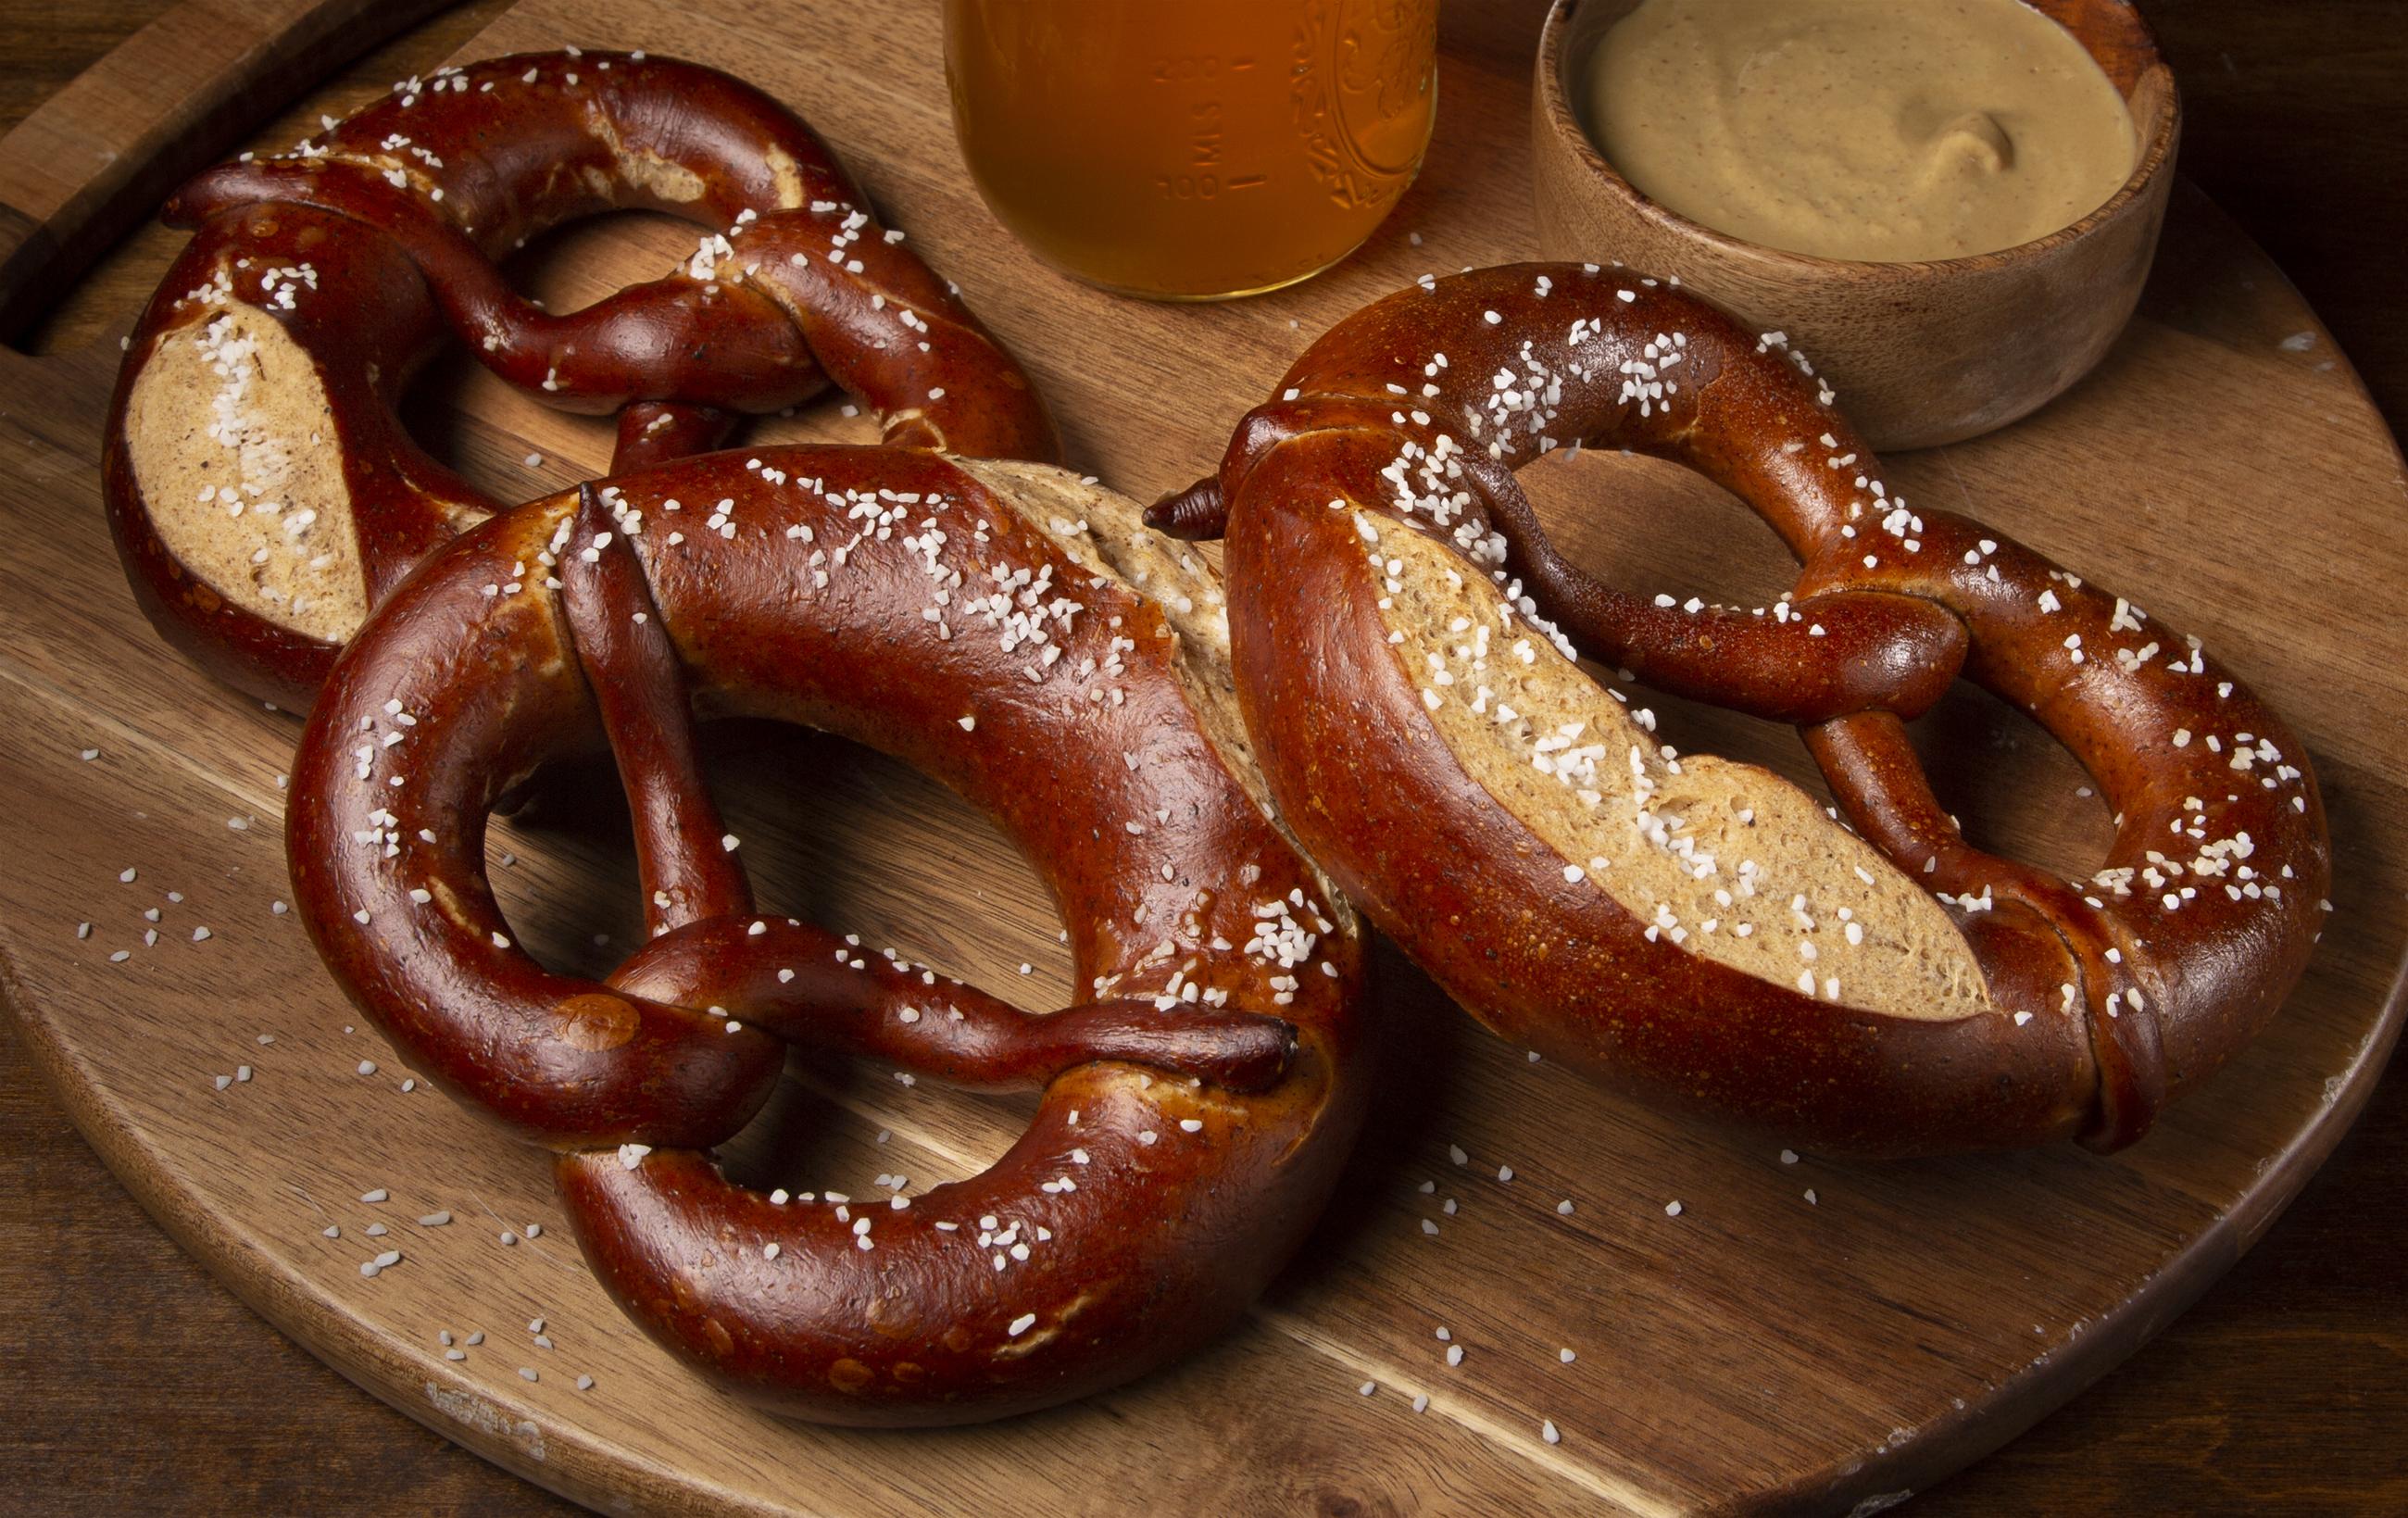 pretzels, beer, craft beer, mustard, bar, Pricing Food Photography, food photography props, Estimating Food Photography Job, Pricing a Food Photography Job